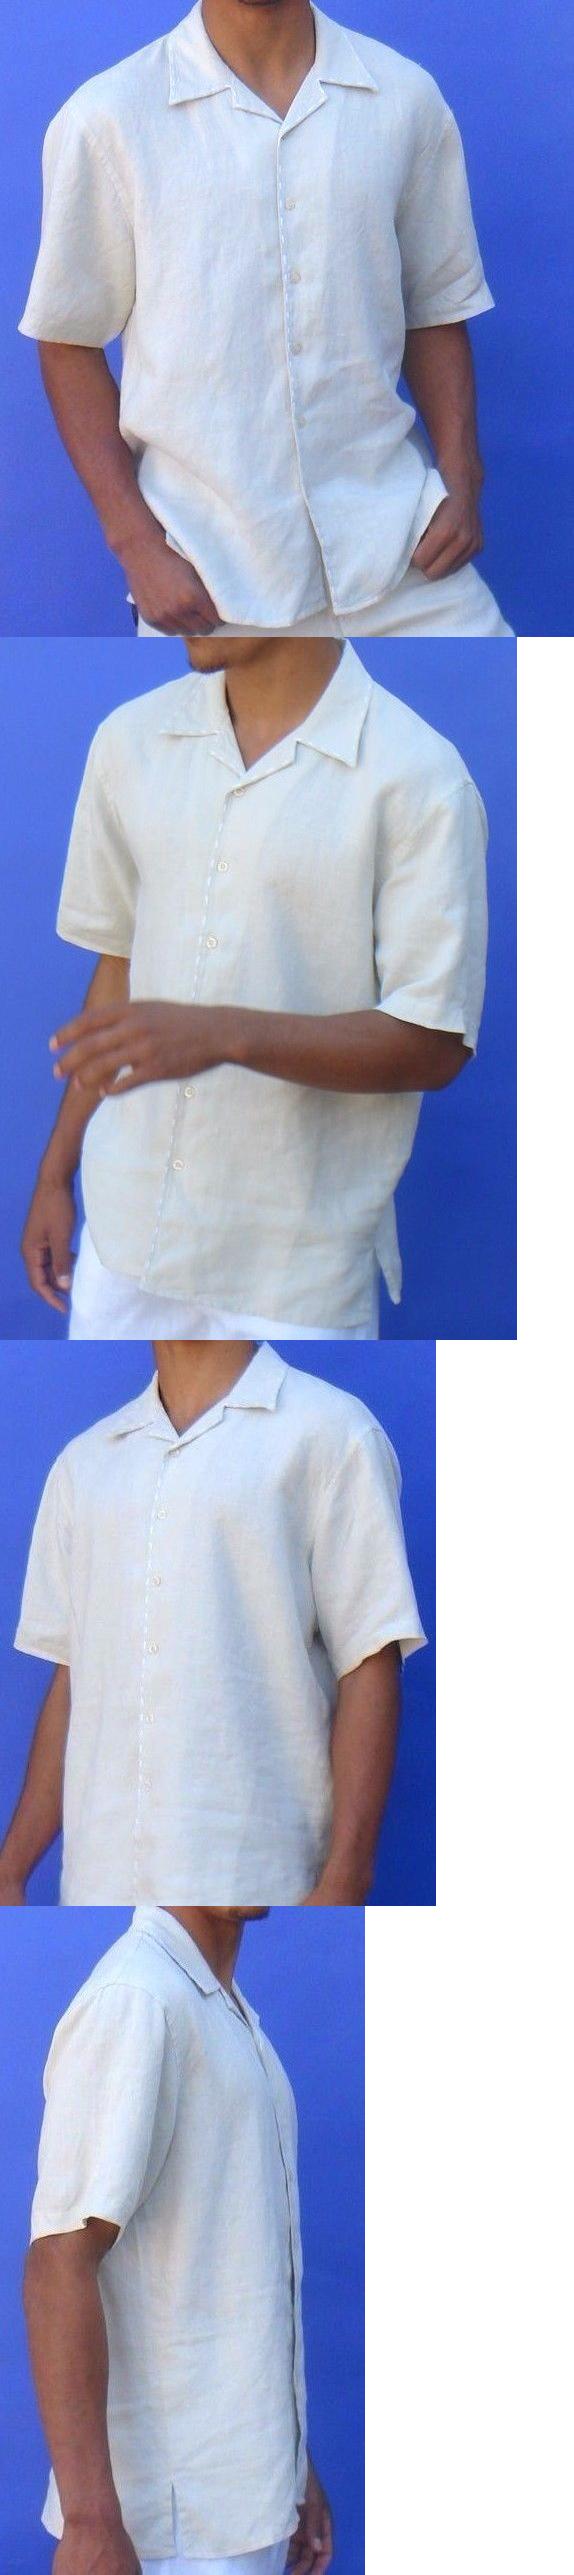 Other mens formal occasion beach weddings linen shirt